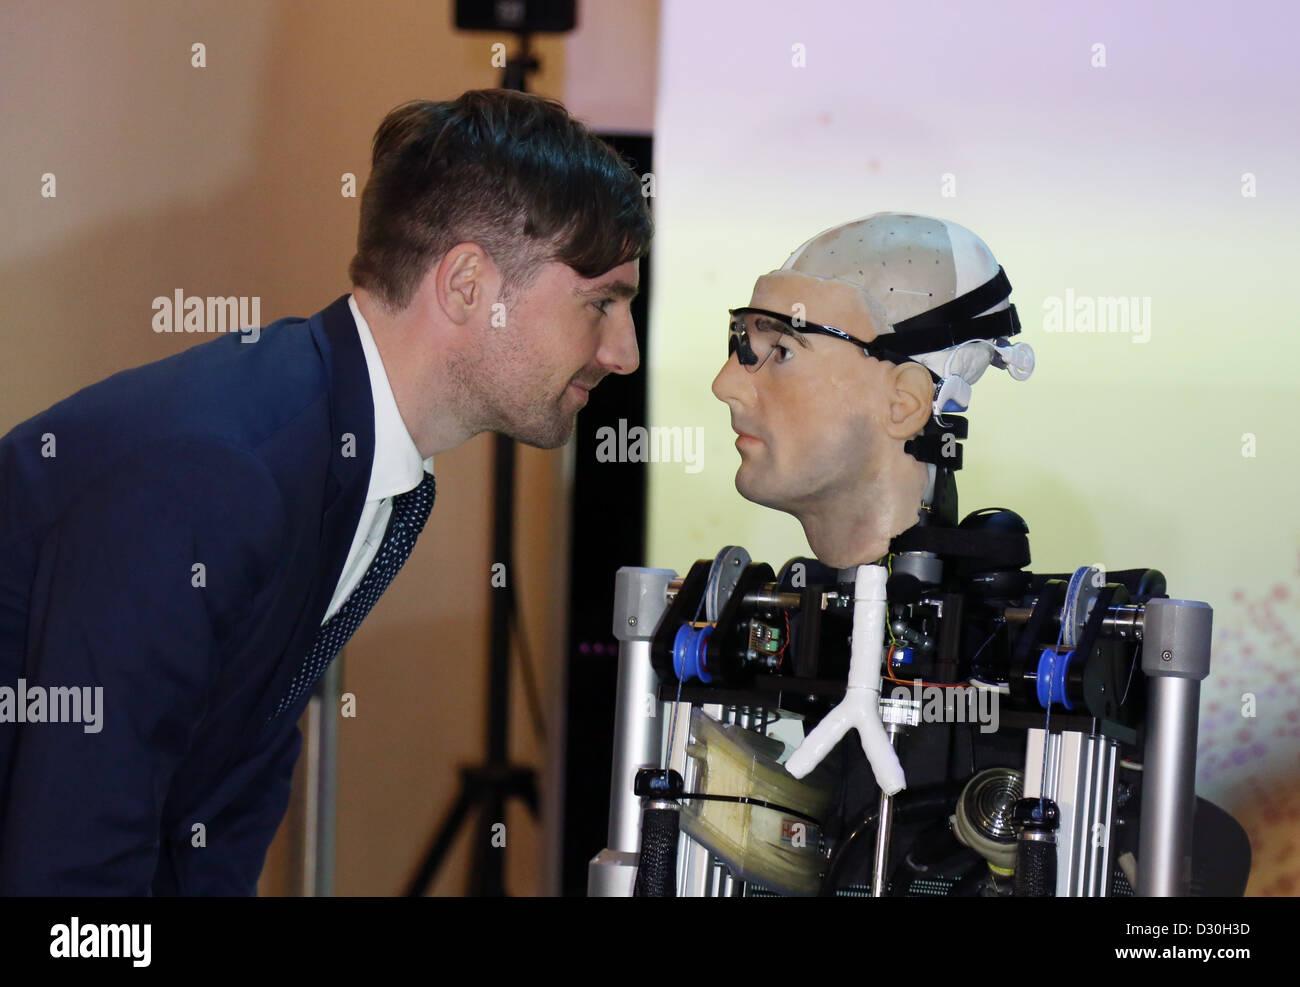 Rex Robot bionic man at Science Museum Bertolt Meyer - Stock Image